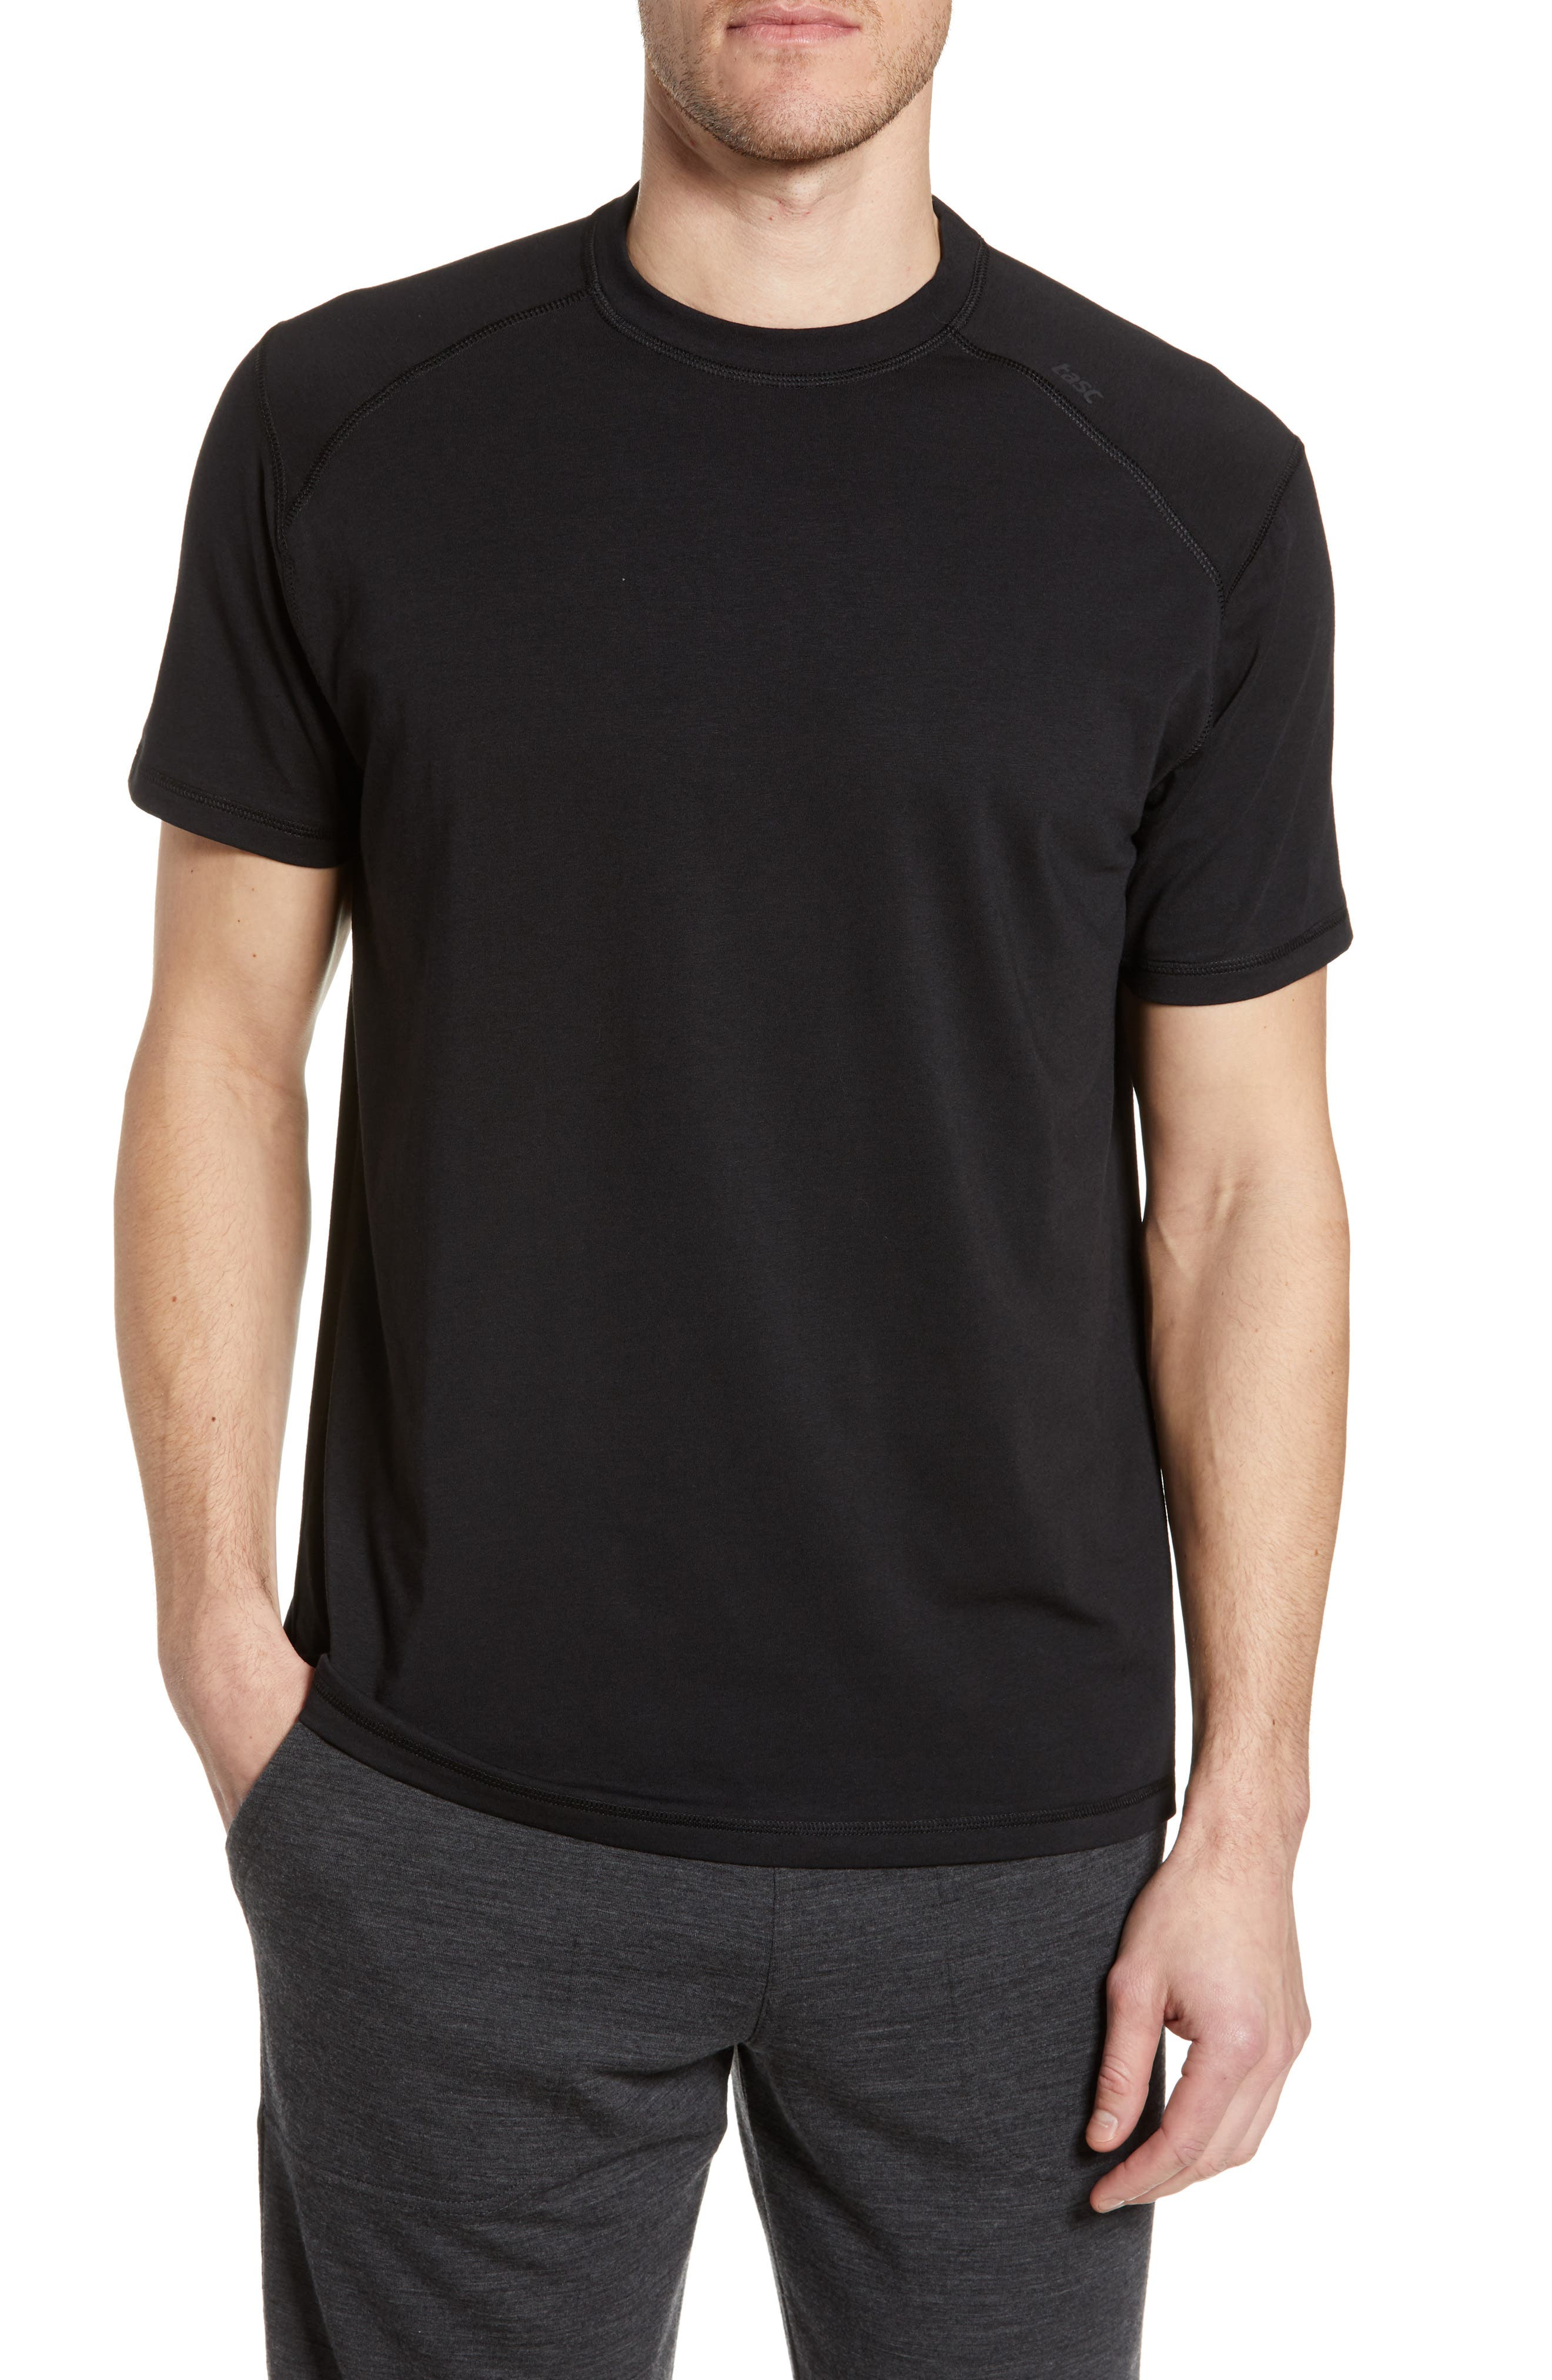 TASC PERFORMANCE Carrollton T-Shirt, Main, color, BLACK